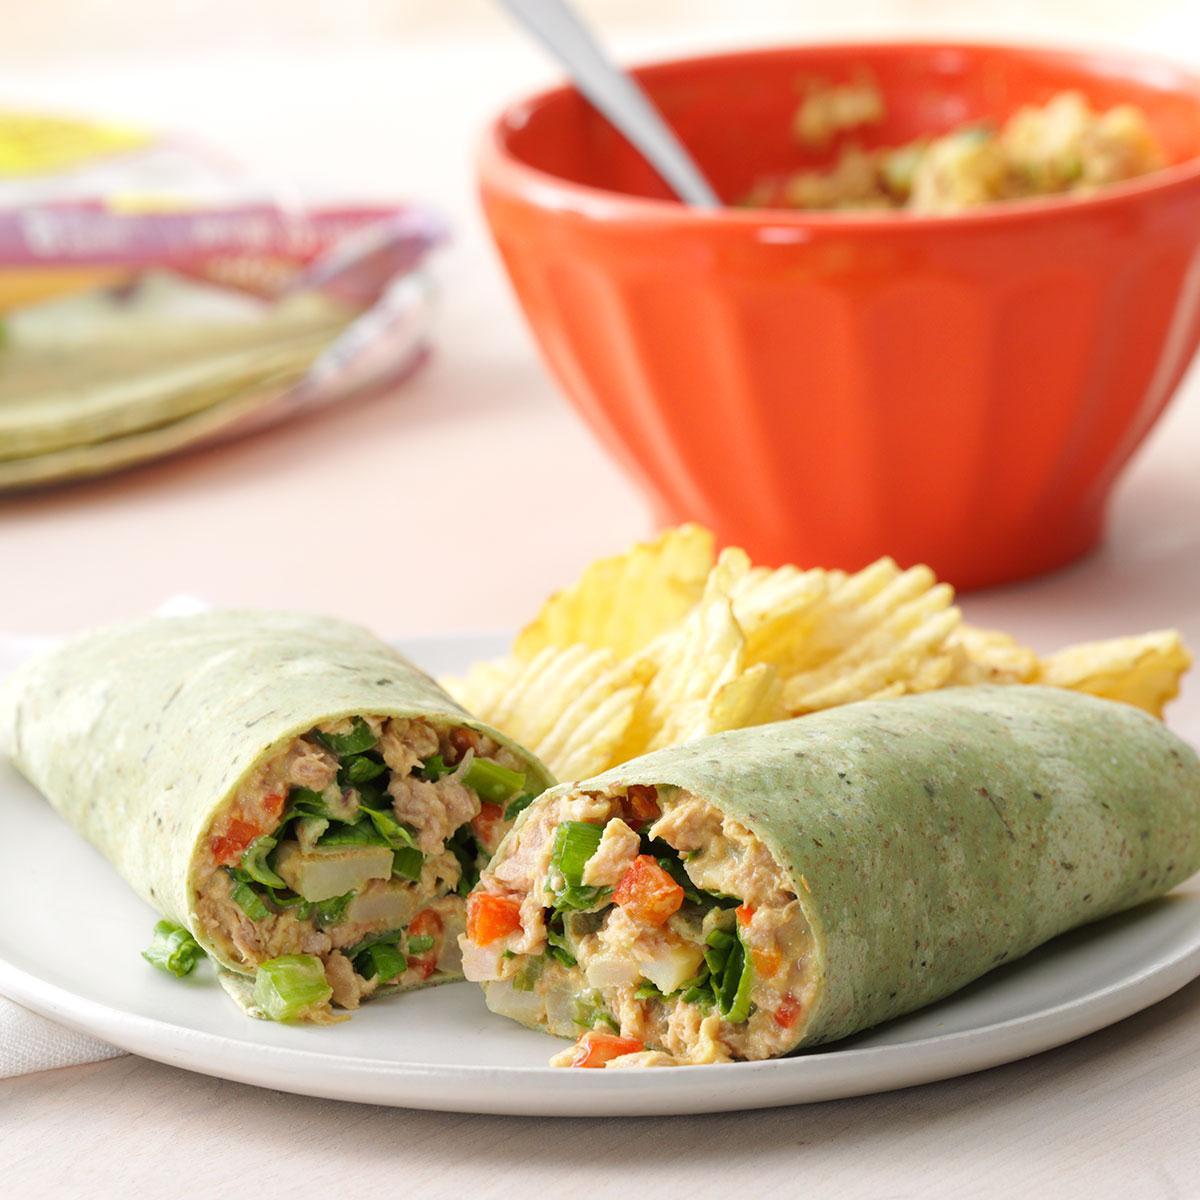 Crunchy Tuna Wraps Recipe | Taste of Home